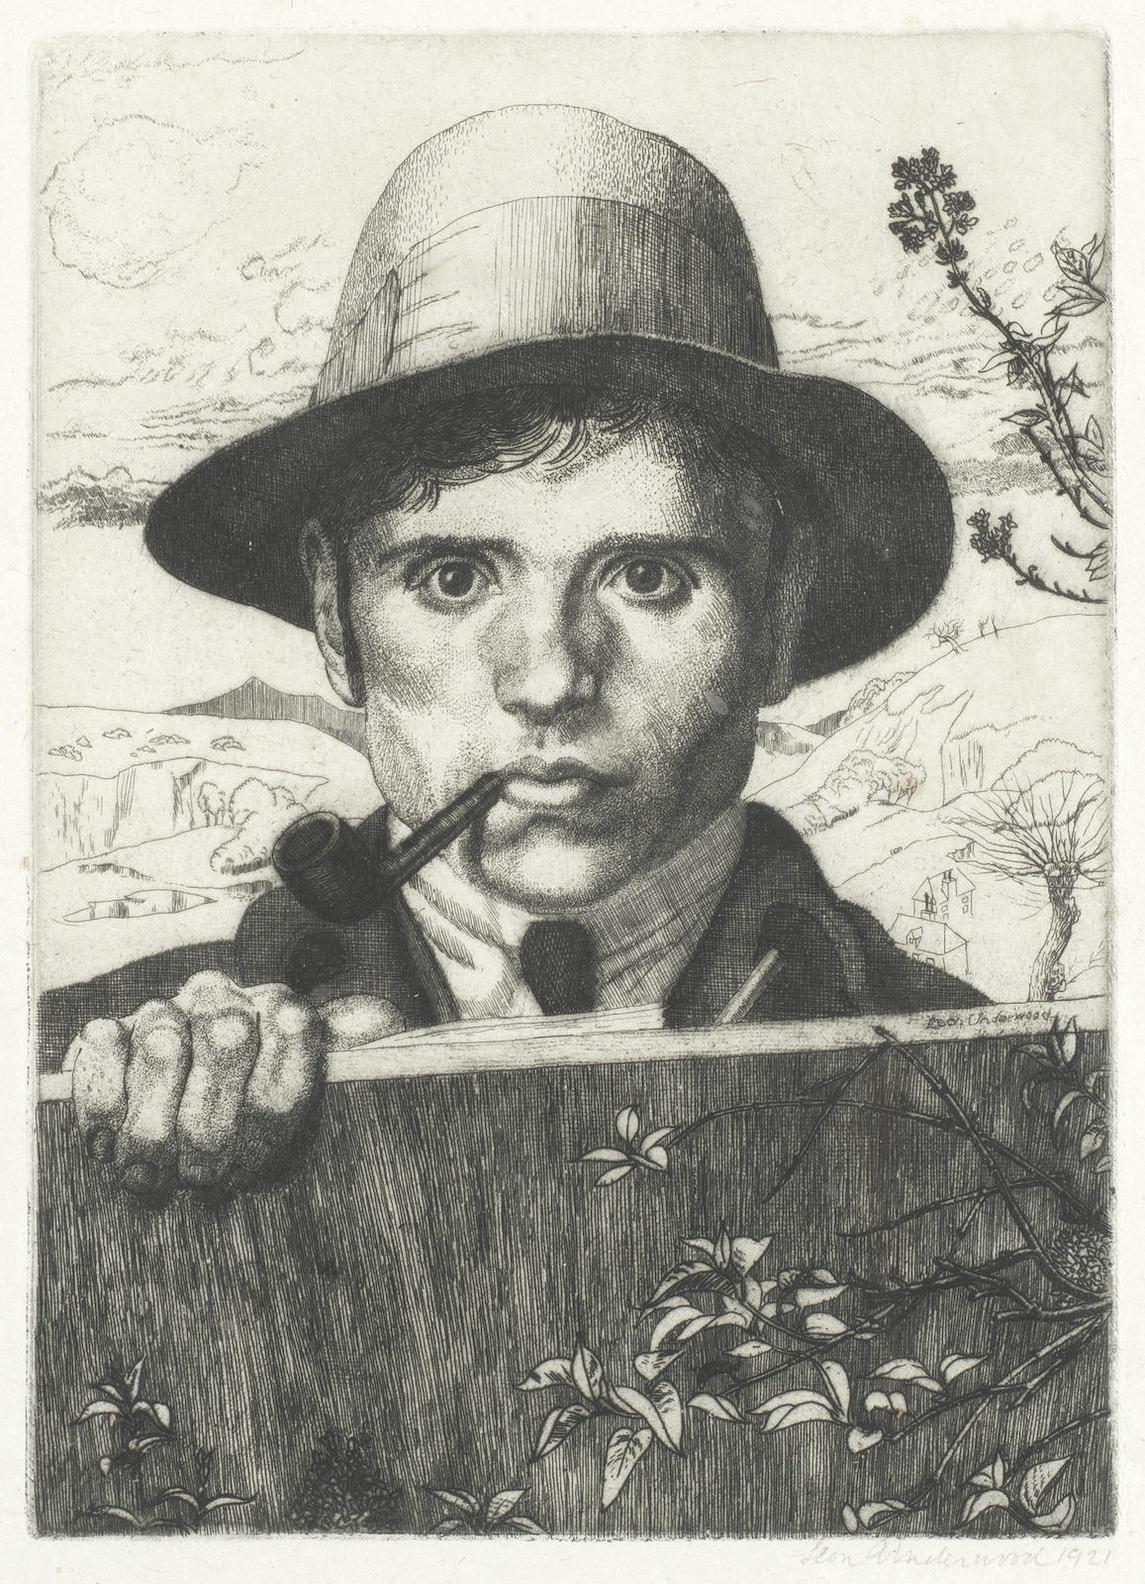 Leon Underwood - Self-Portrait In A Landscape-1921